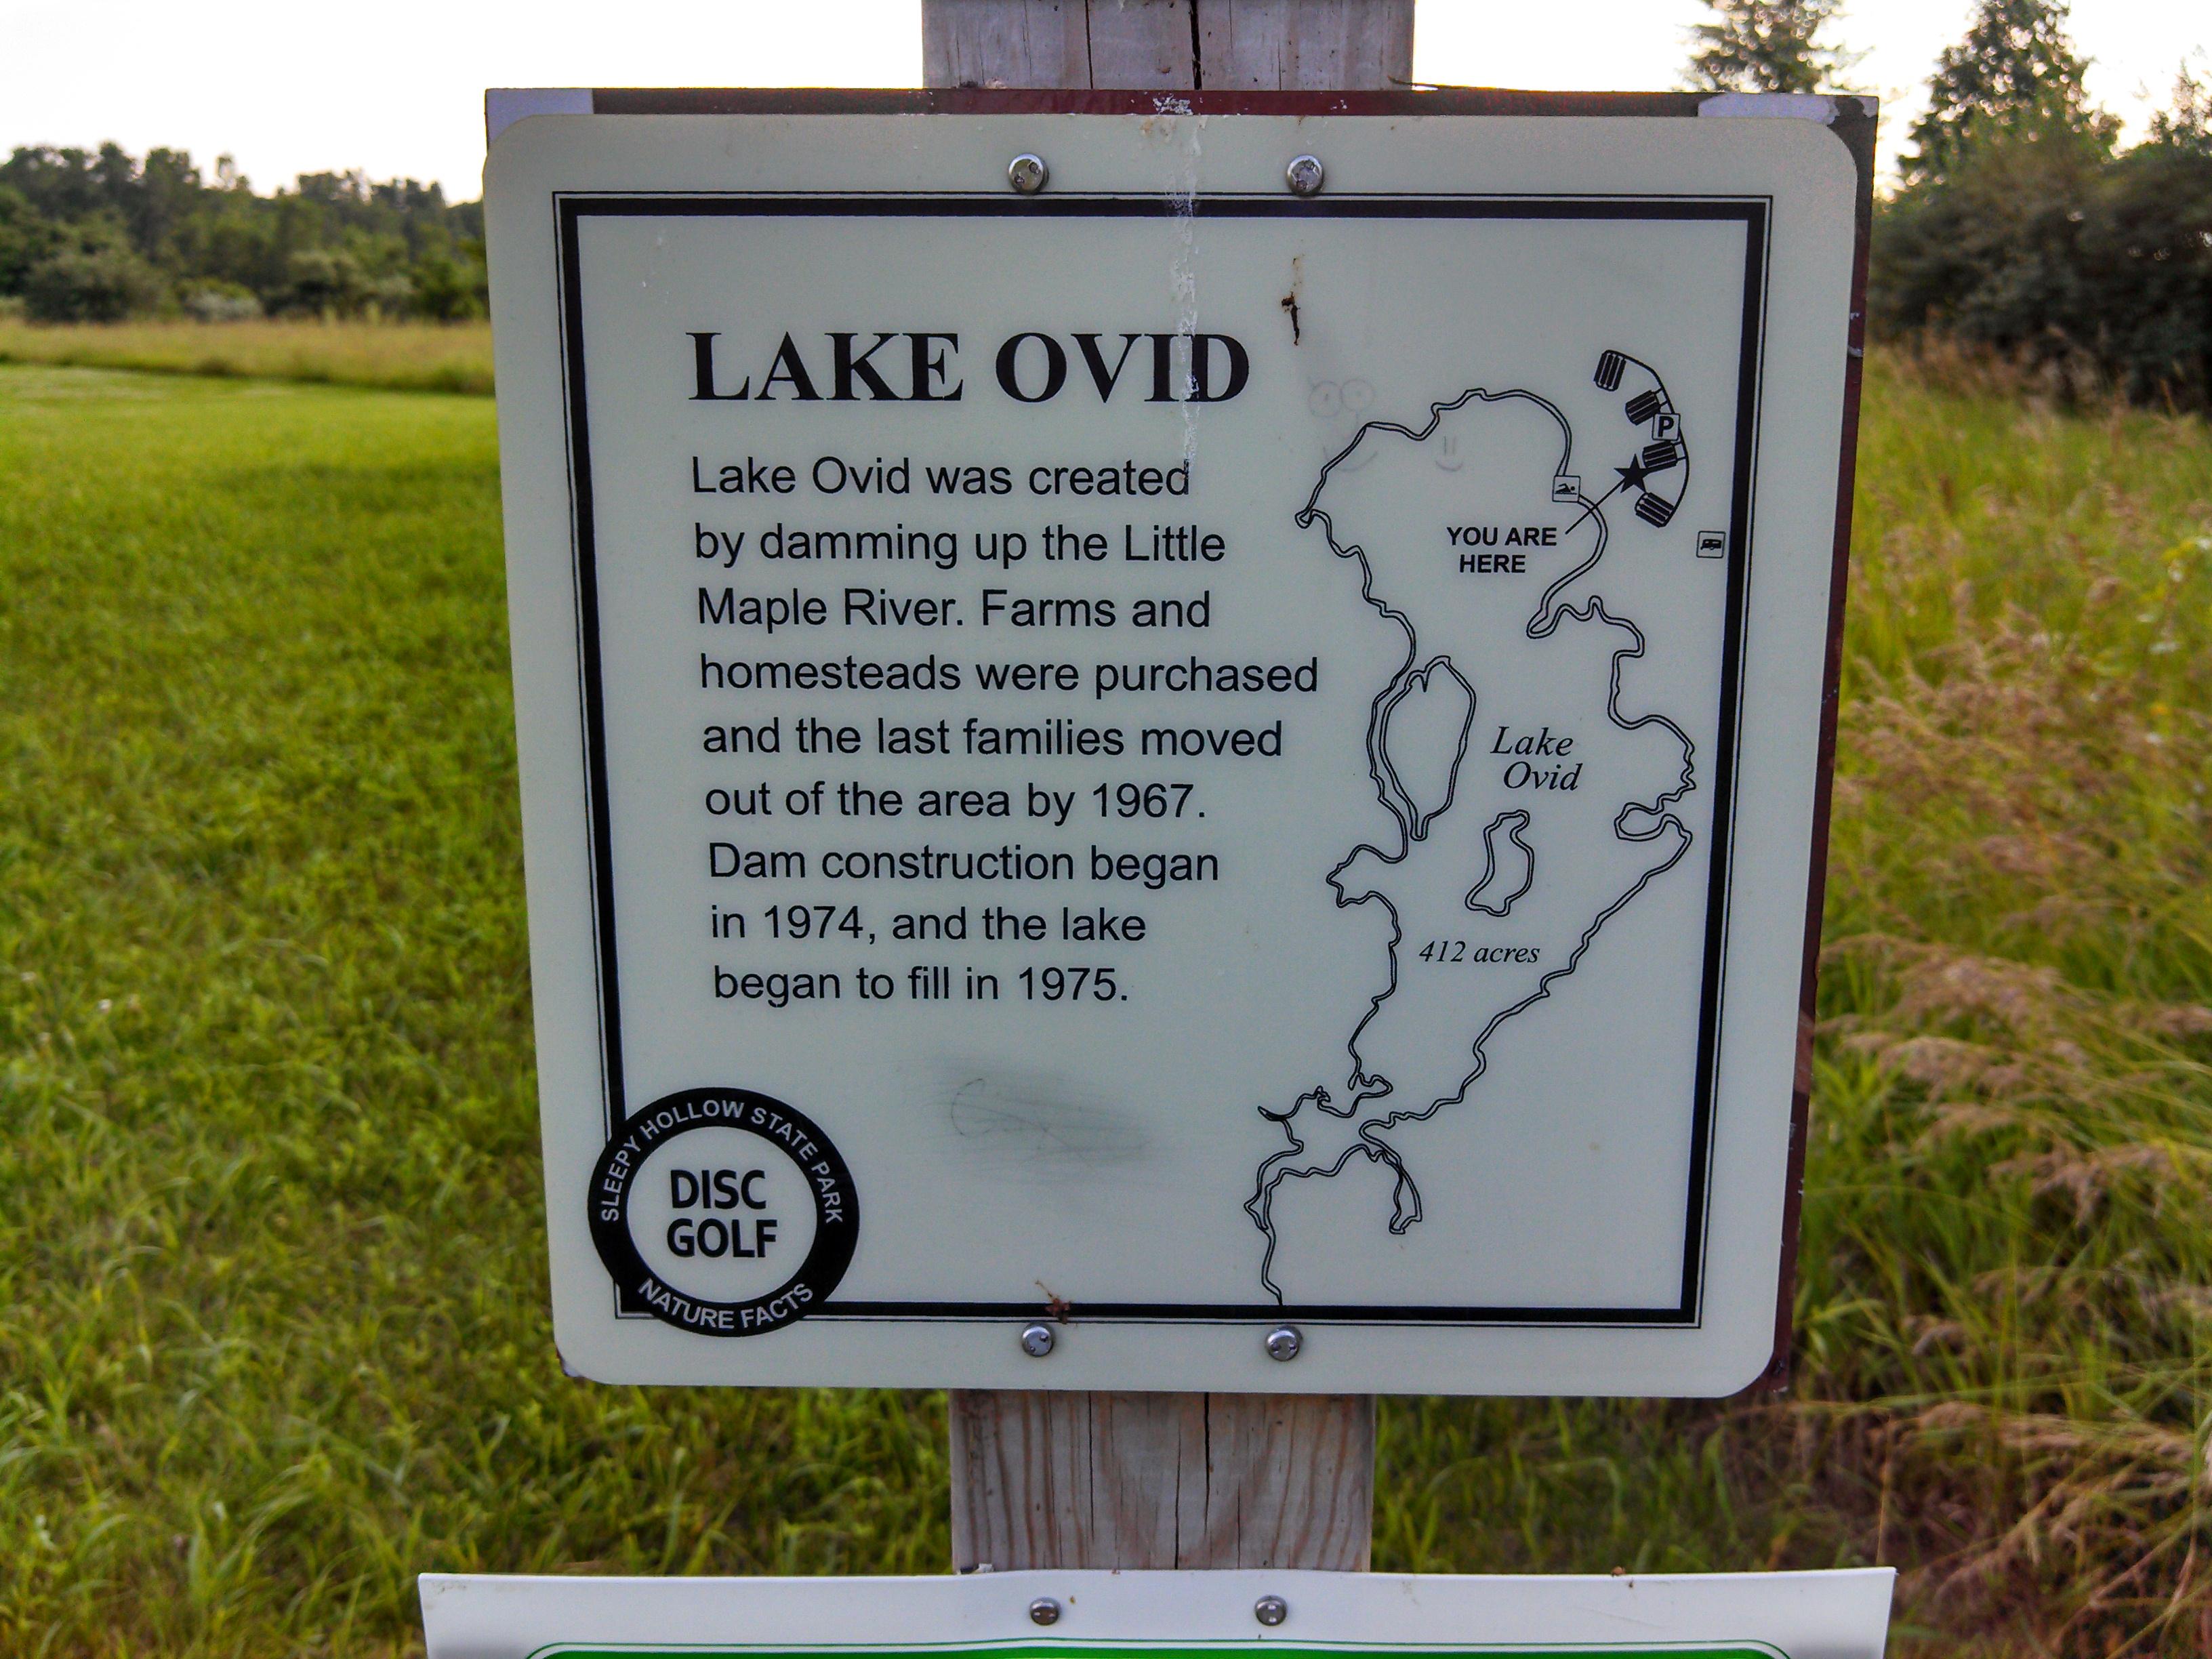 History of Lake Ovid